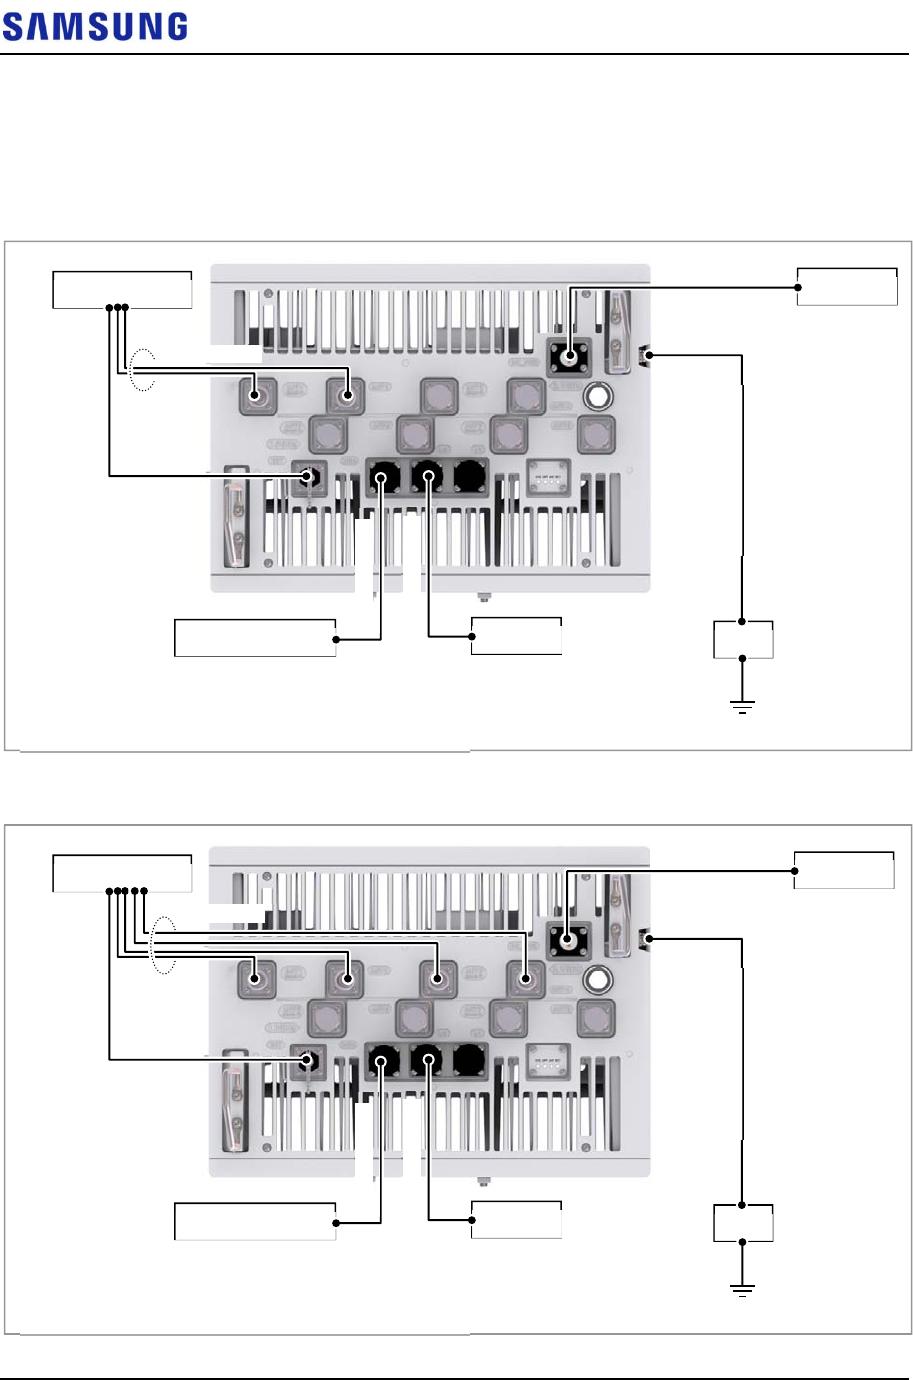 Samsung Electronics Co RFV01U-D1A RRU (RFV01U) User Manual 2